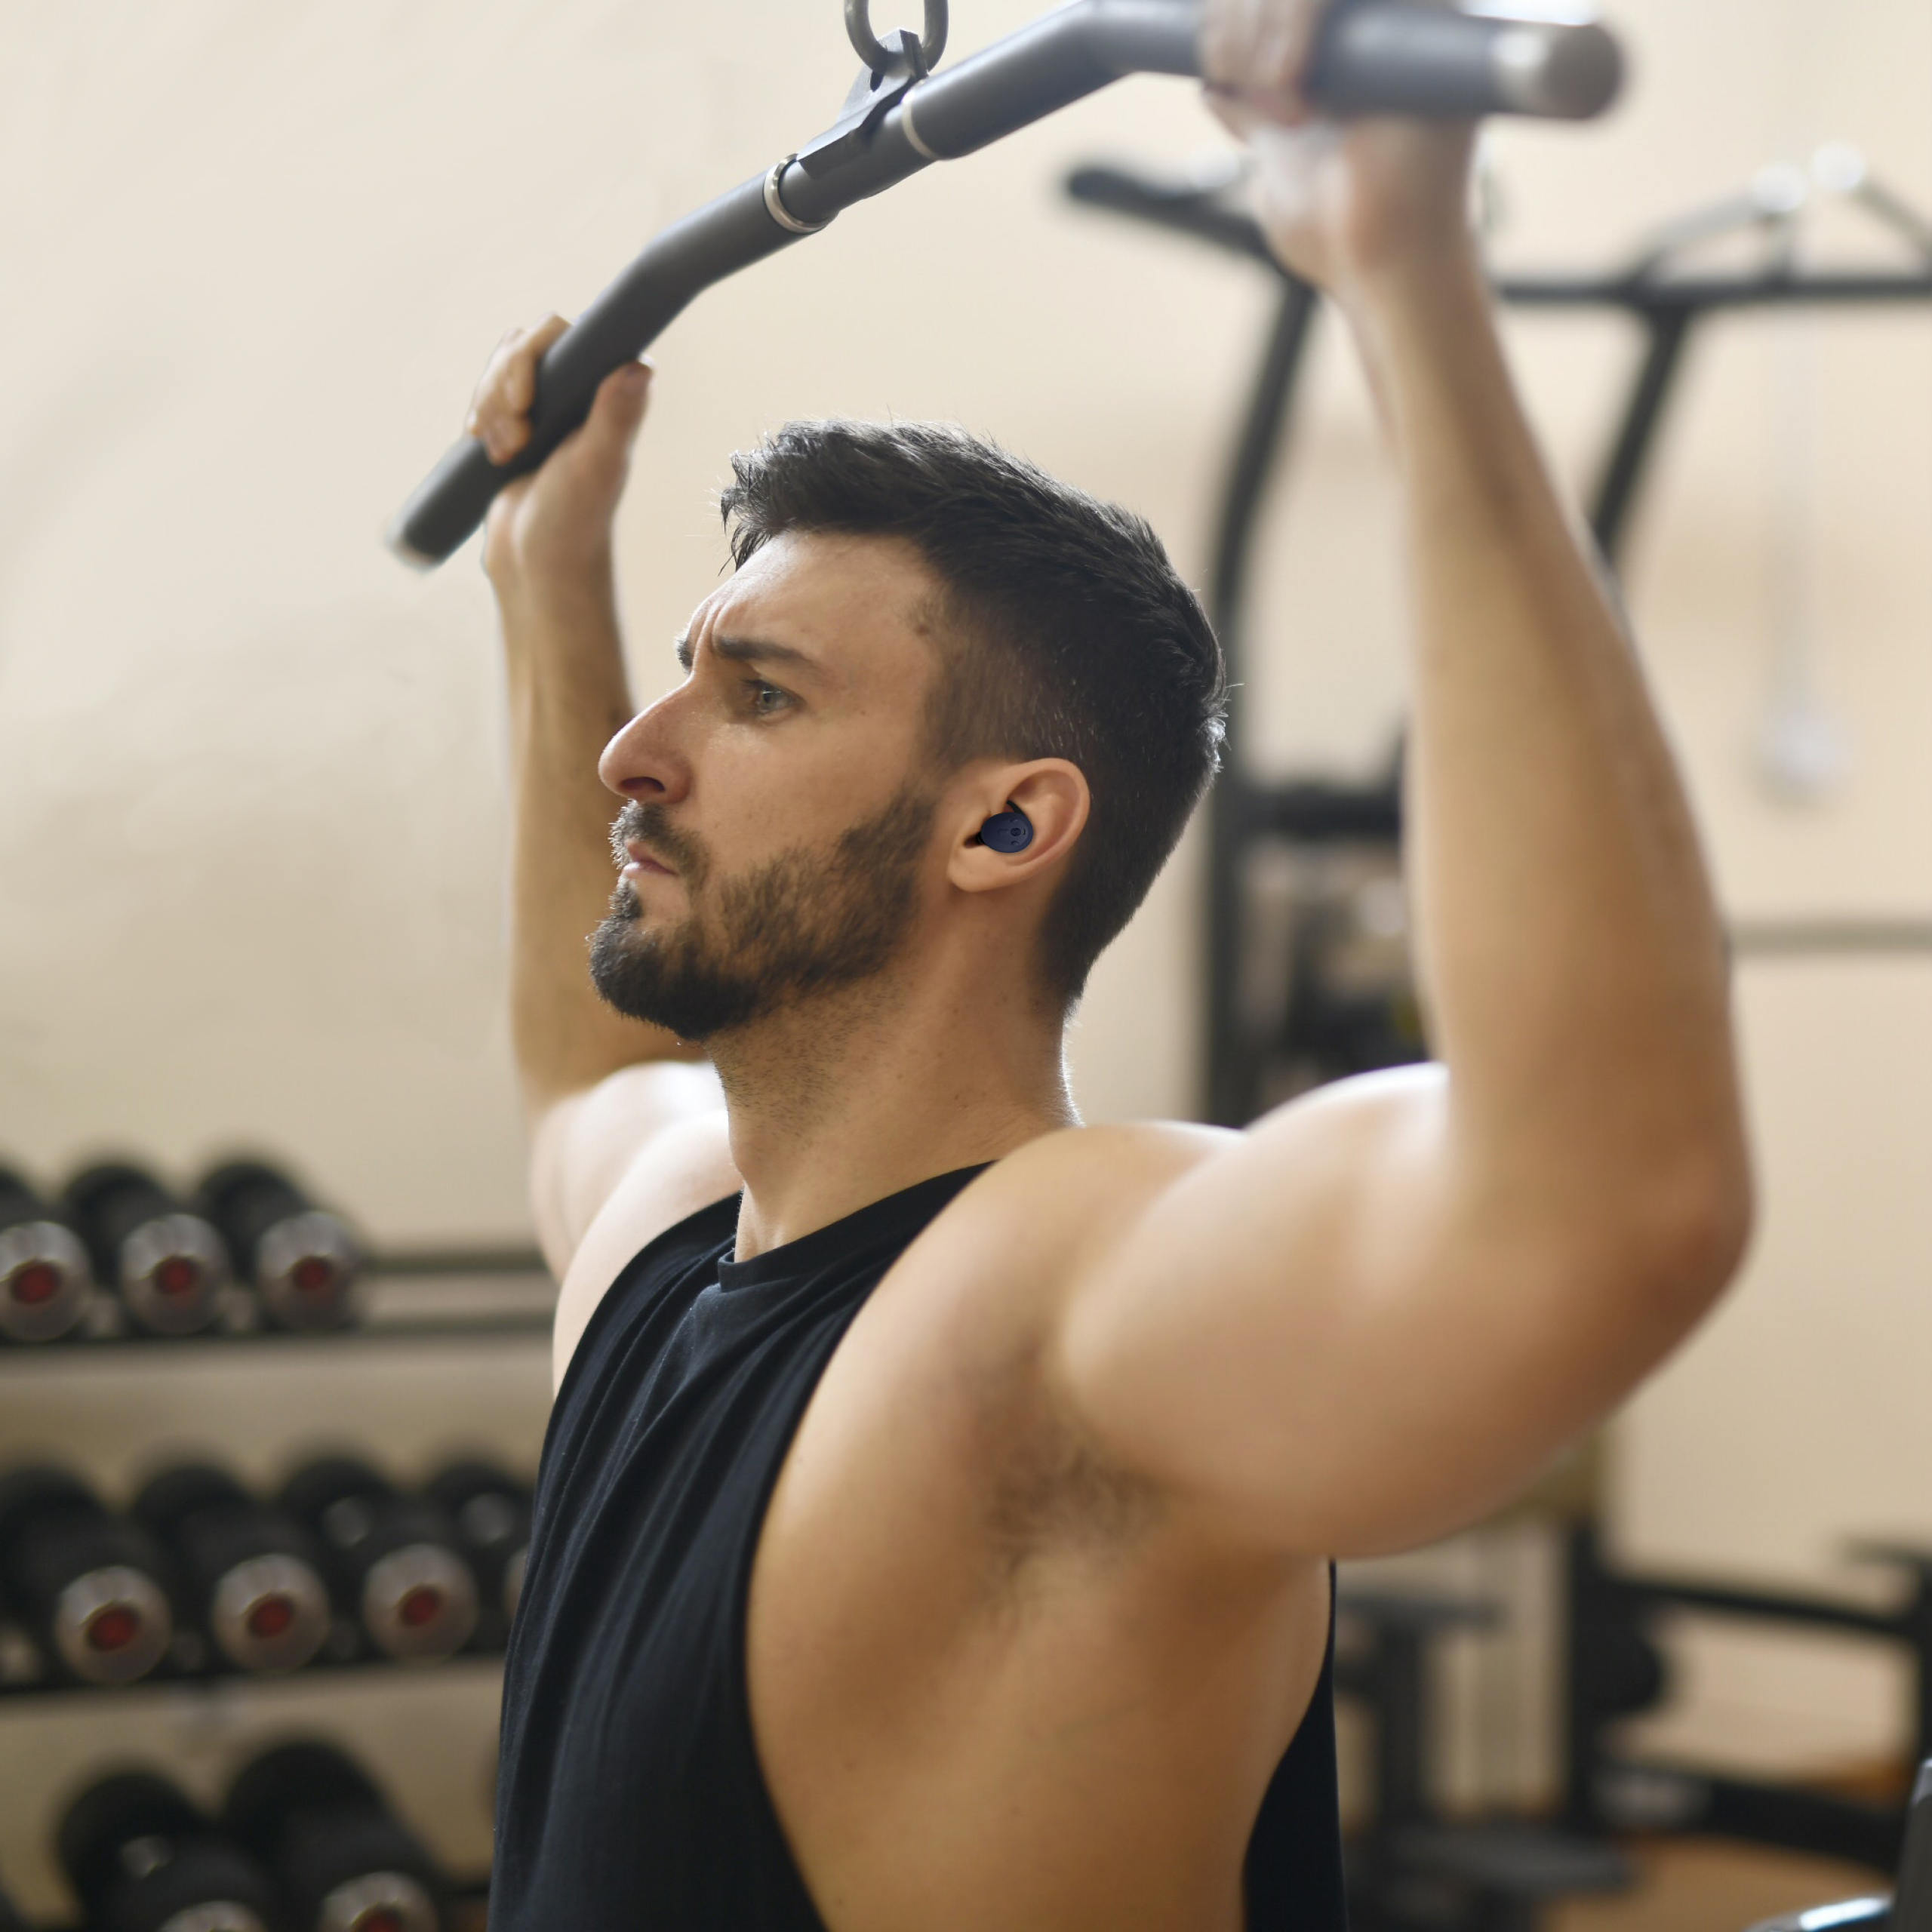 sport-oordoppen-gym